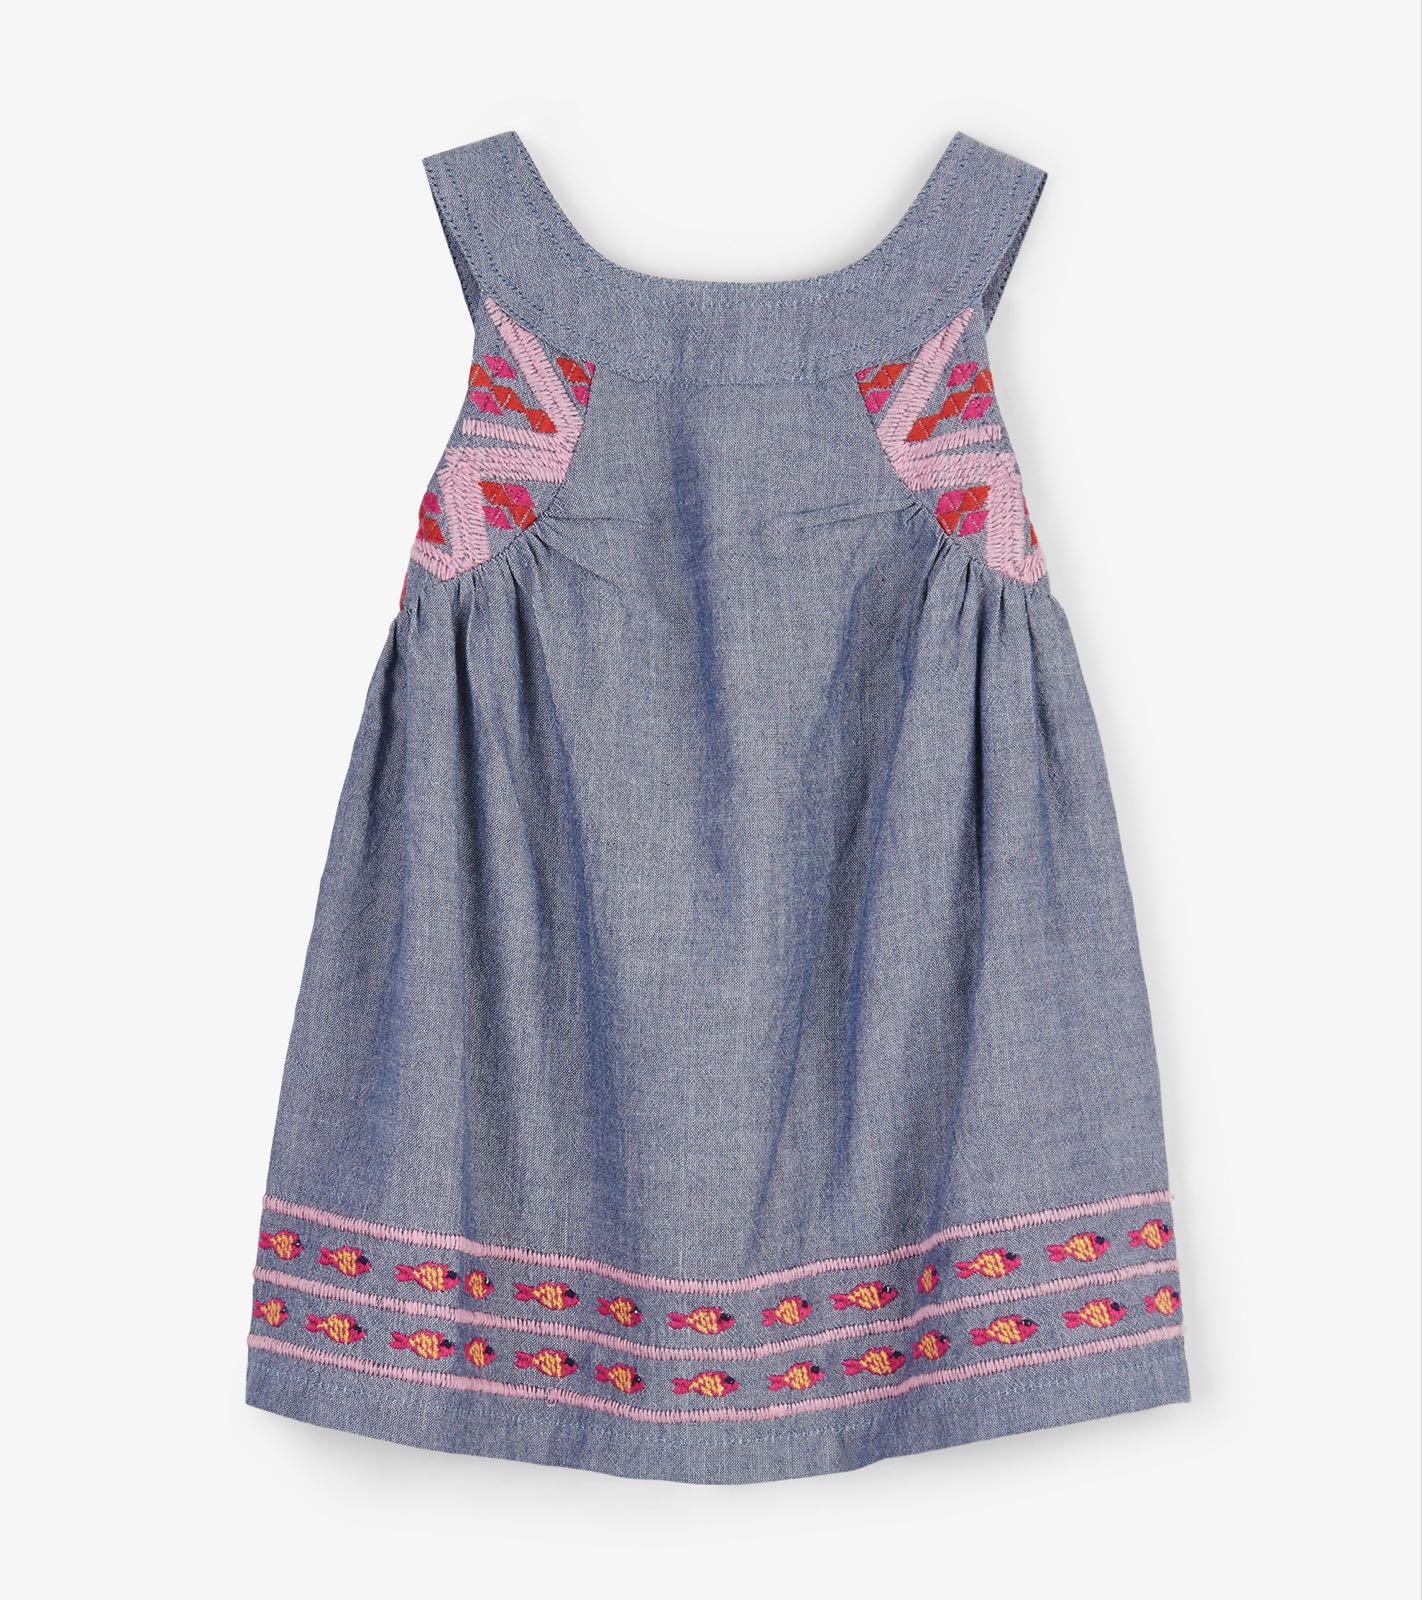 Hatley Chambray Baby Dress